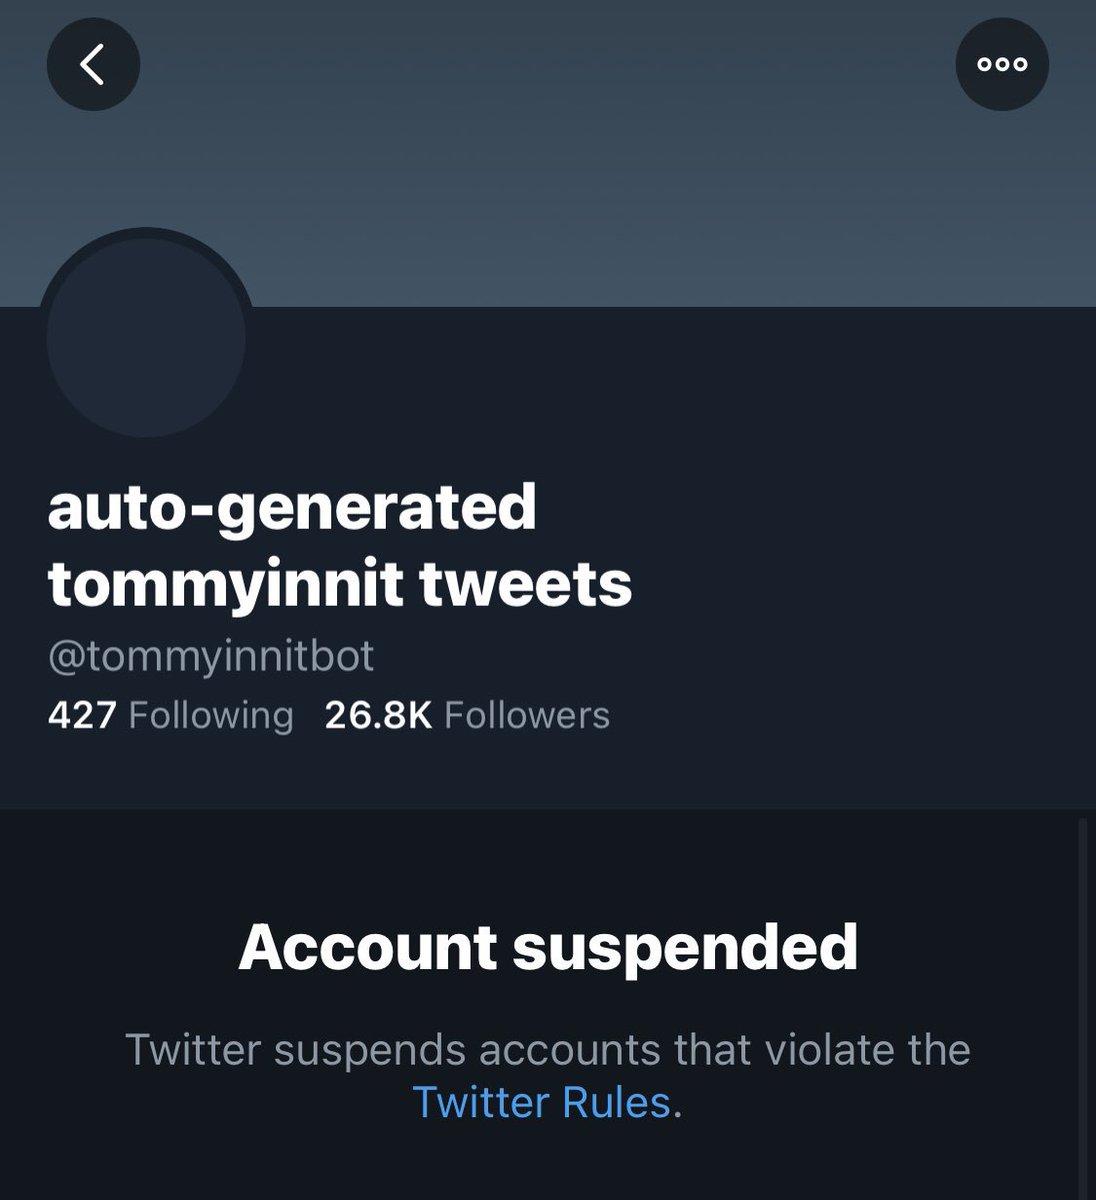 MY MAN DID NOTHING WRONG #freetommybot